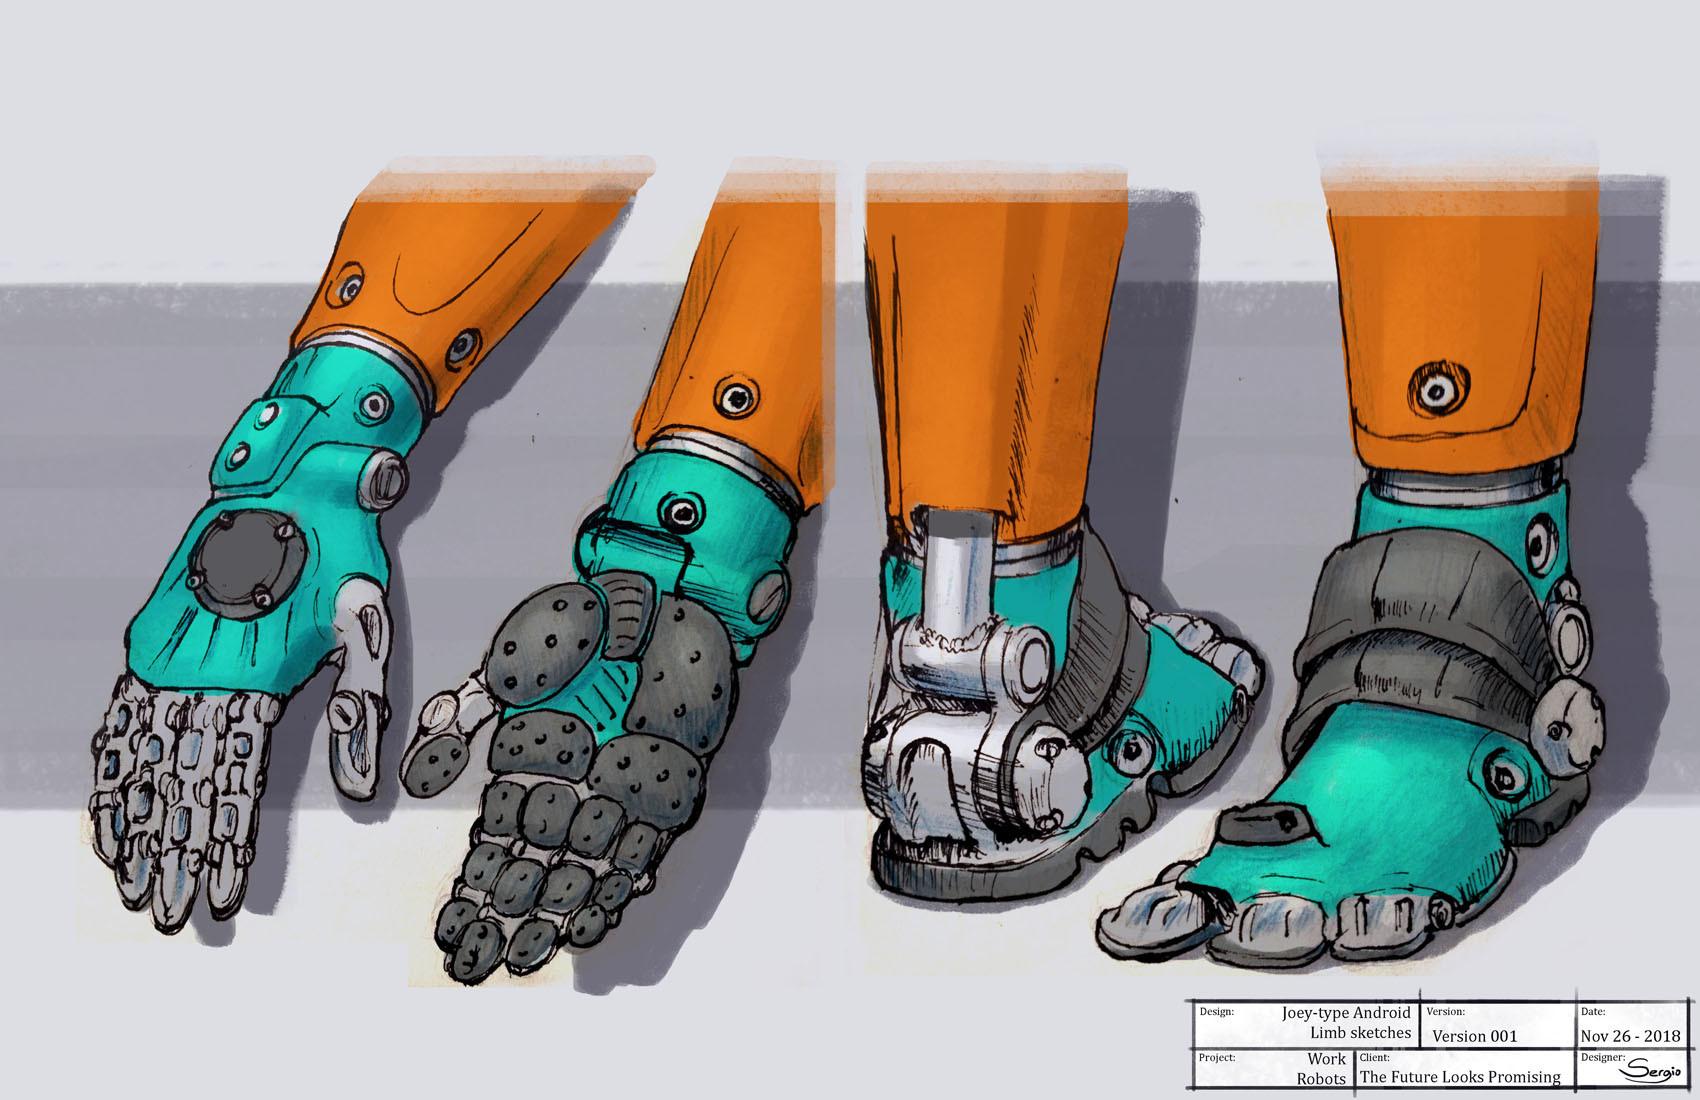 Sergio botero tflp masonbot limb sketches